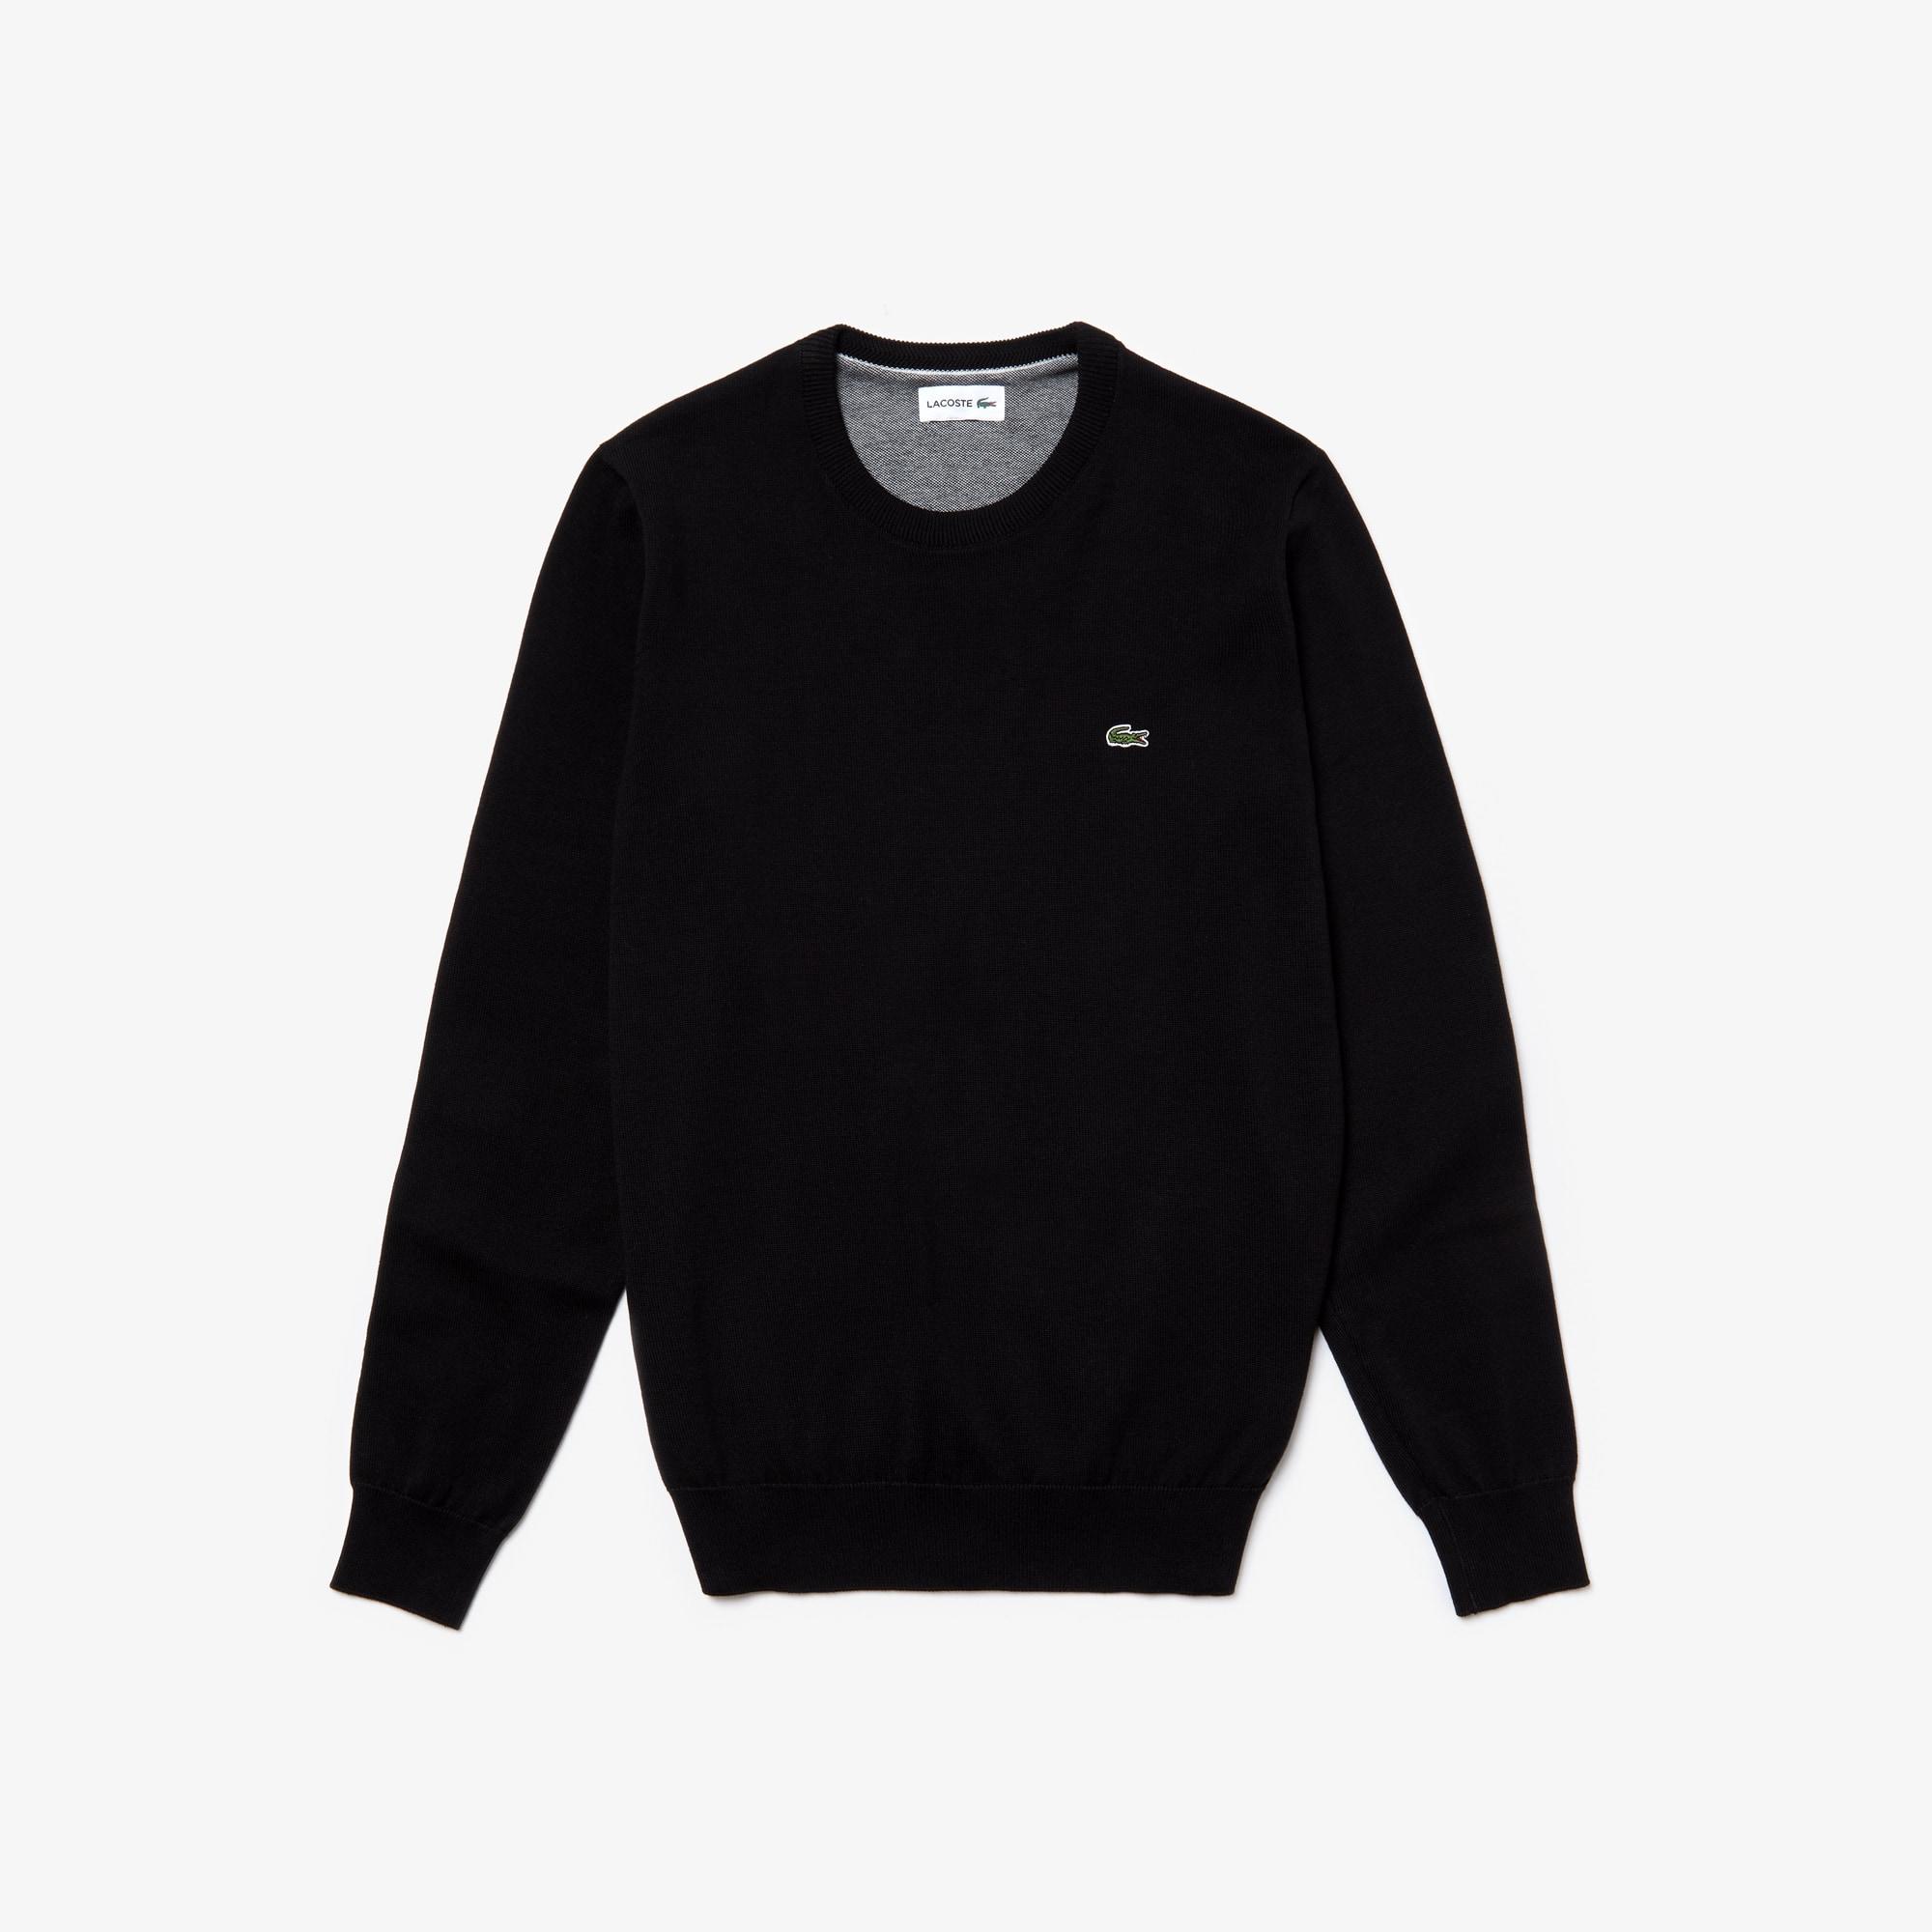 Men's Crew Neck Caviar Piqué Accent Cotton Jersey Sweater